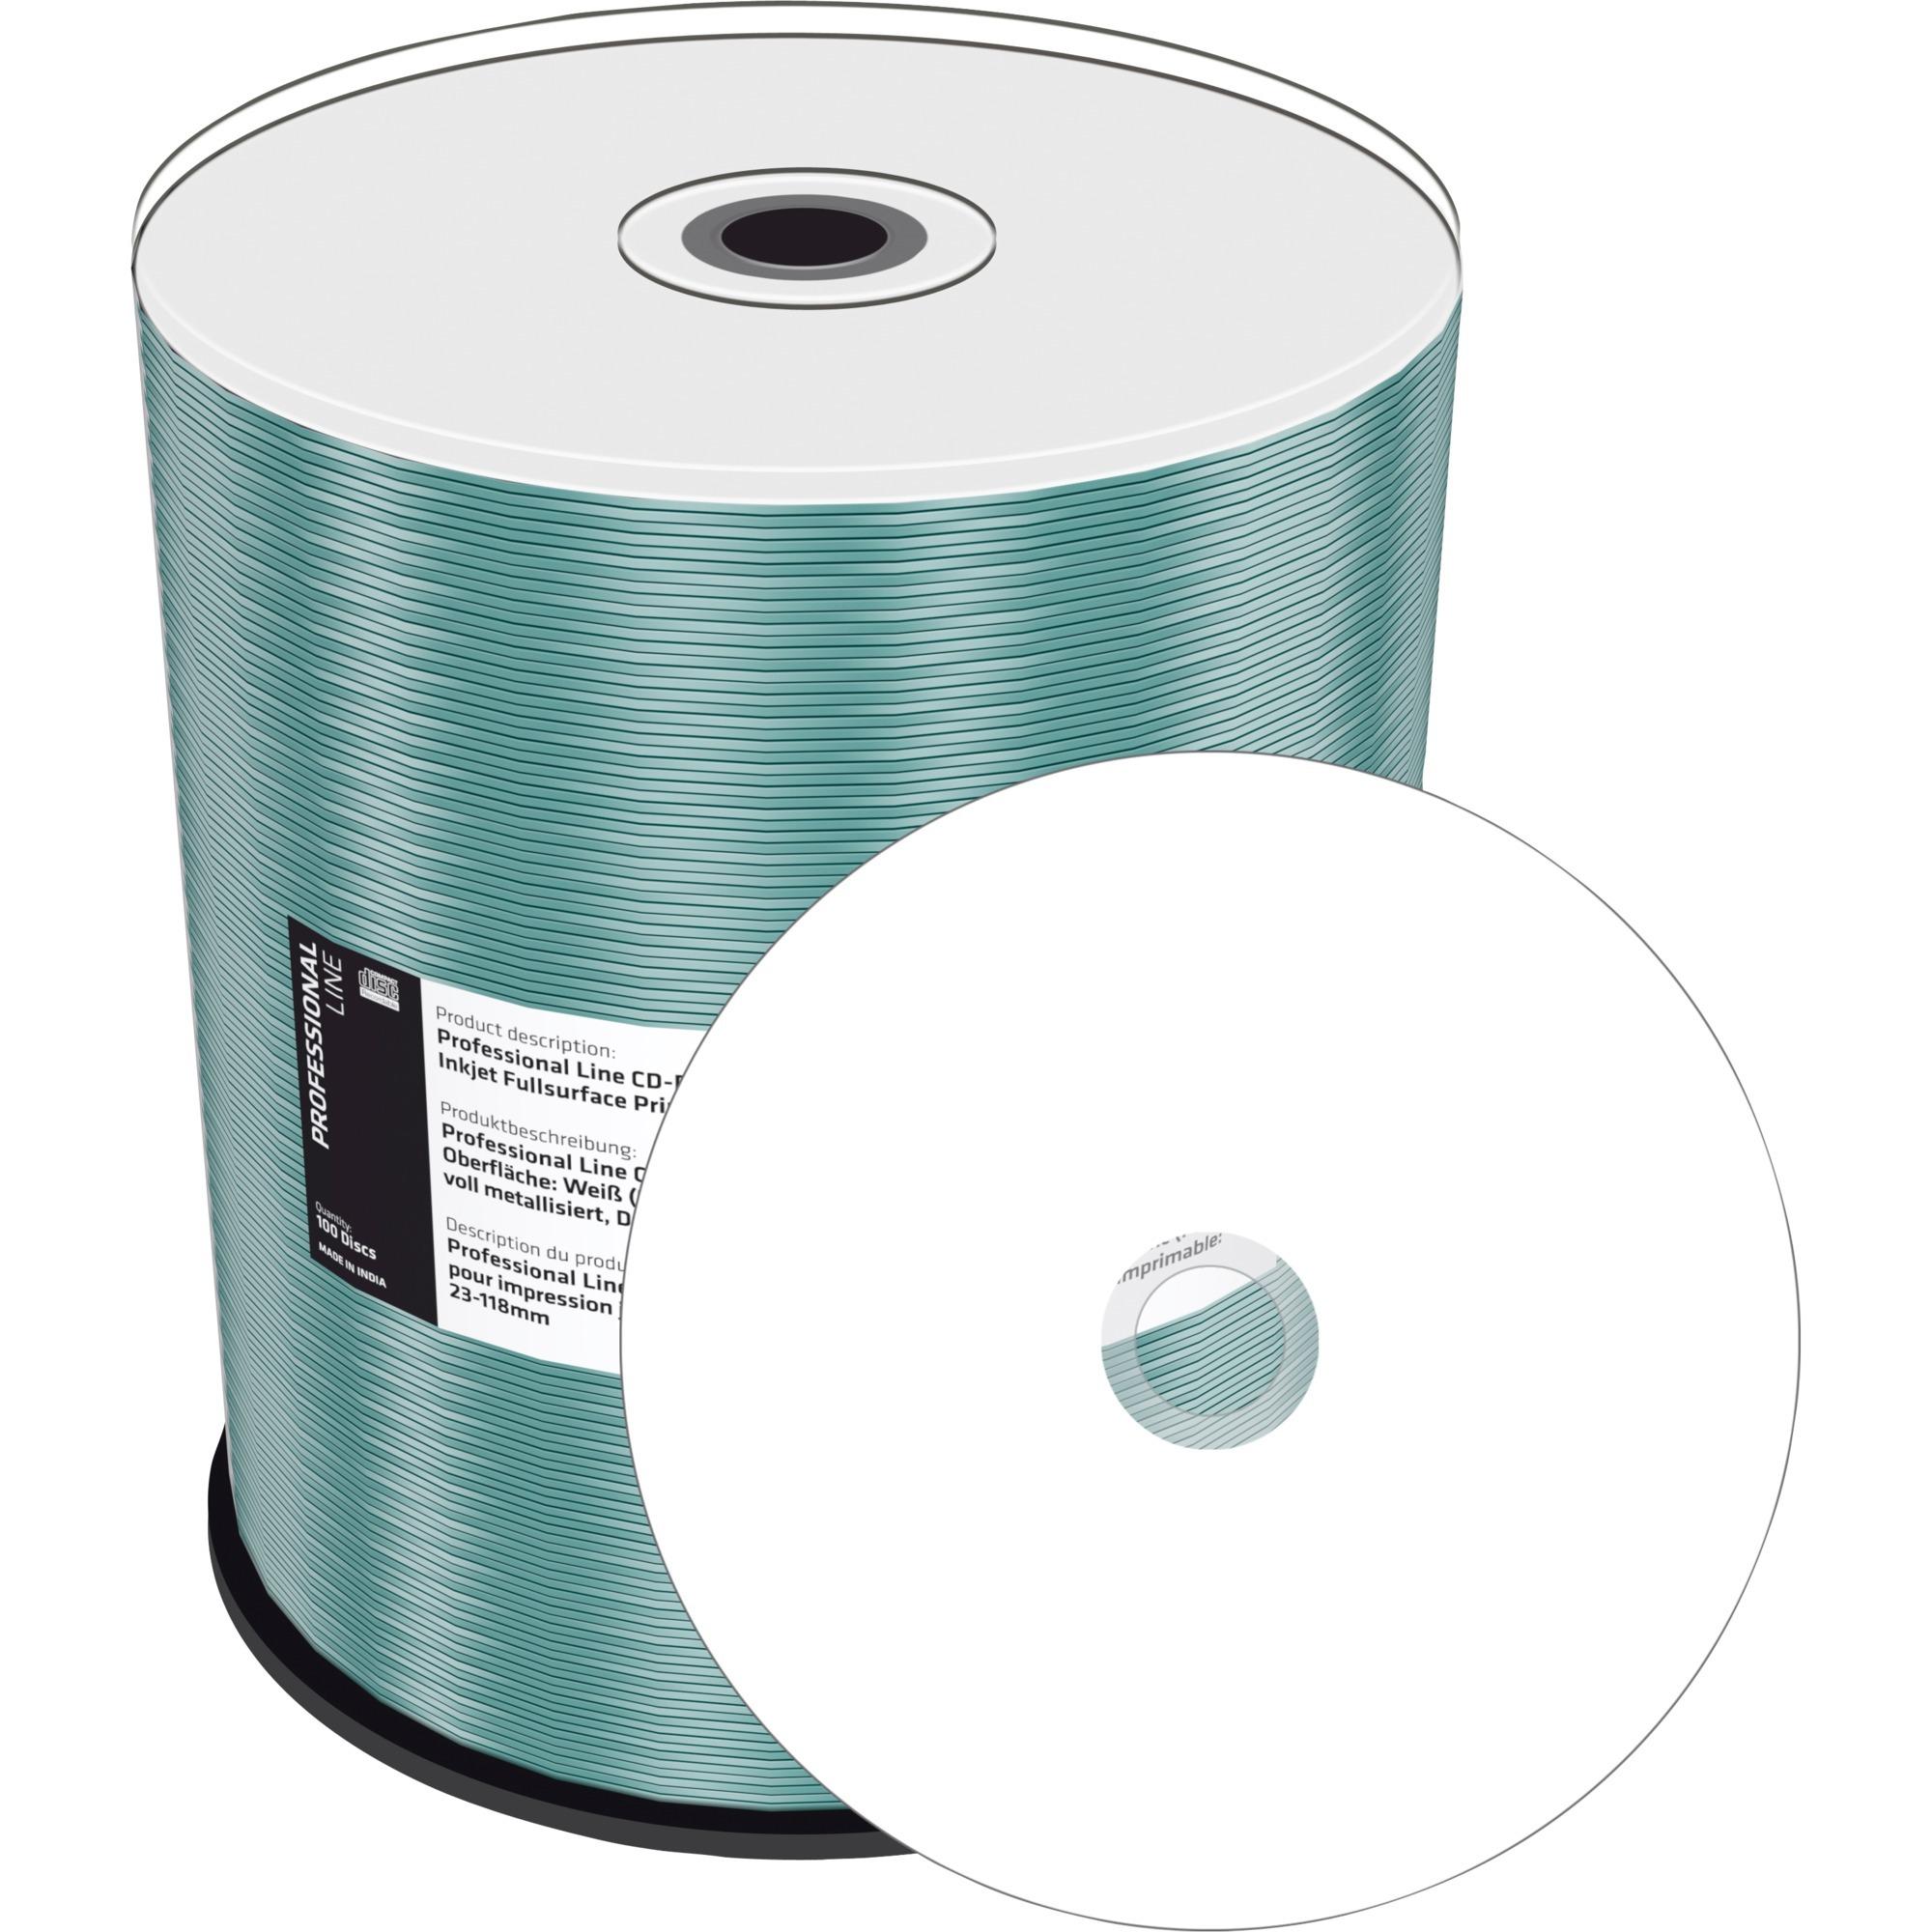 MRPL501-C CD-R 700Mo 100pièce(s) CD vierge